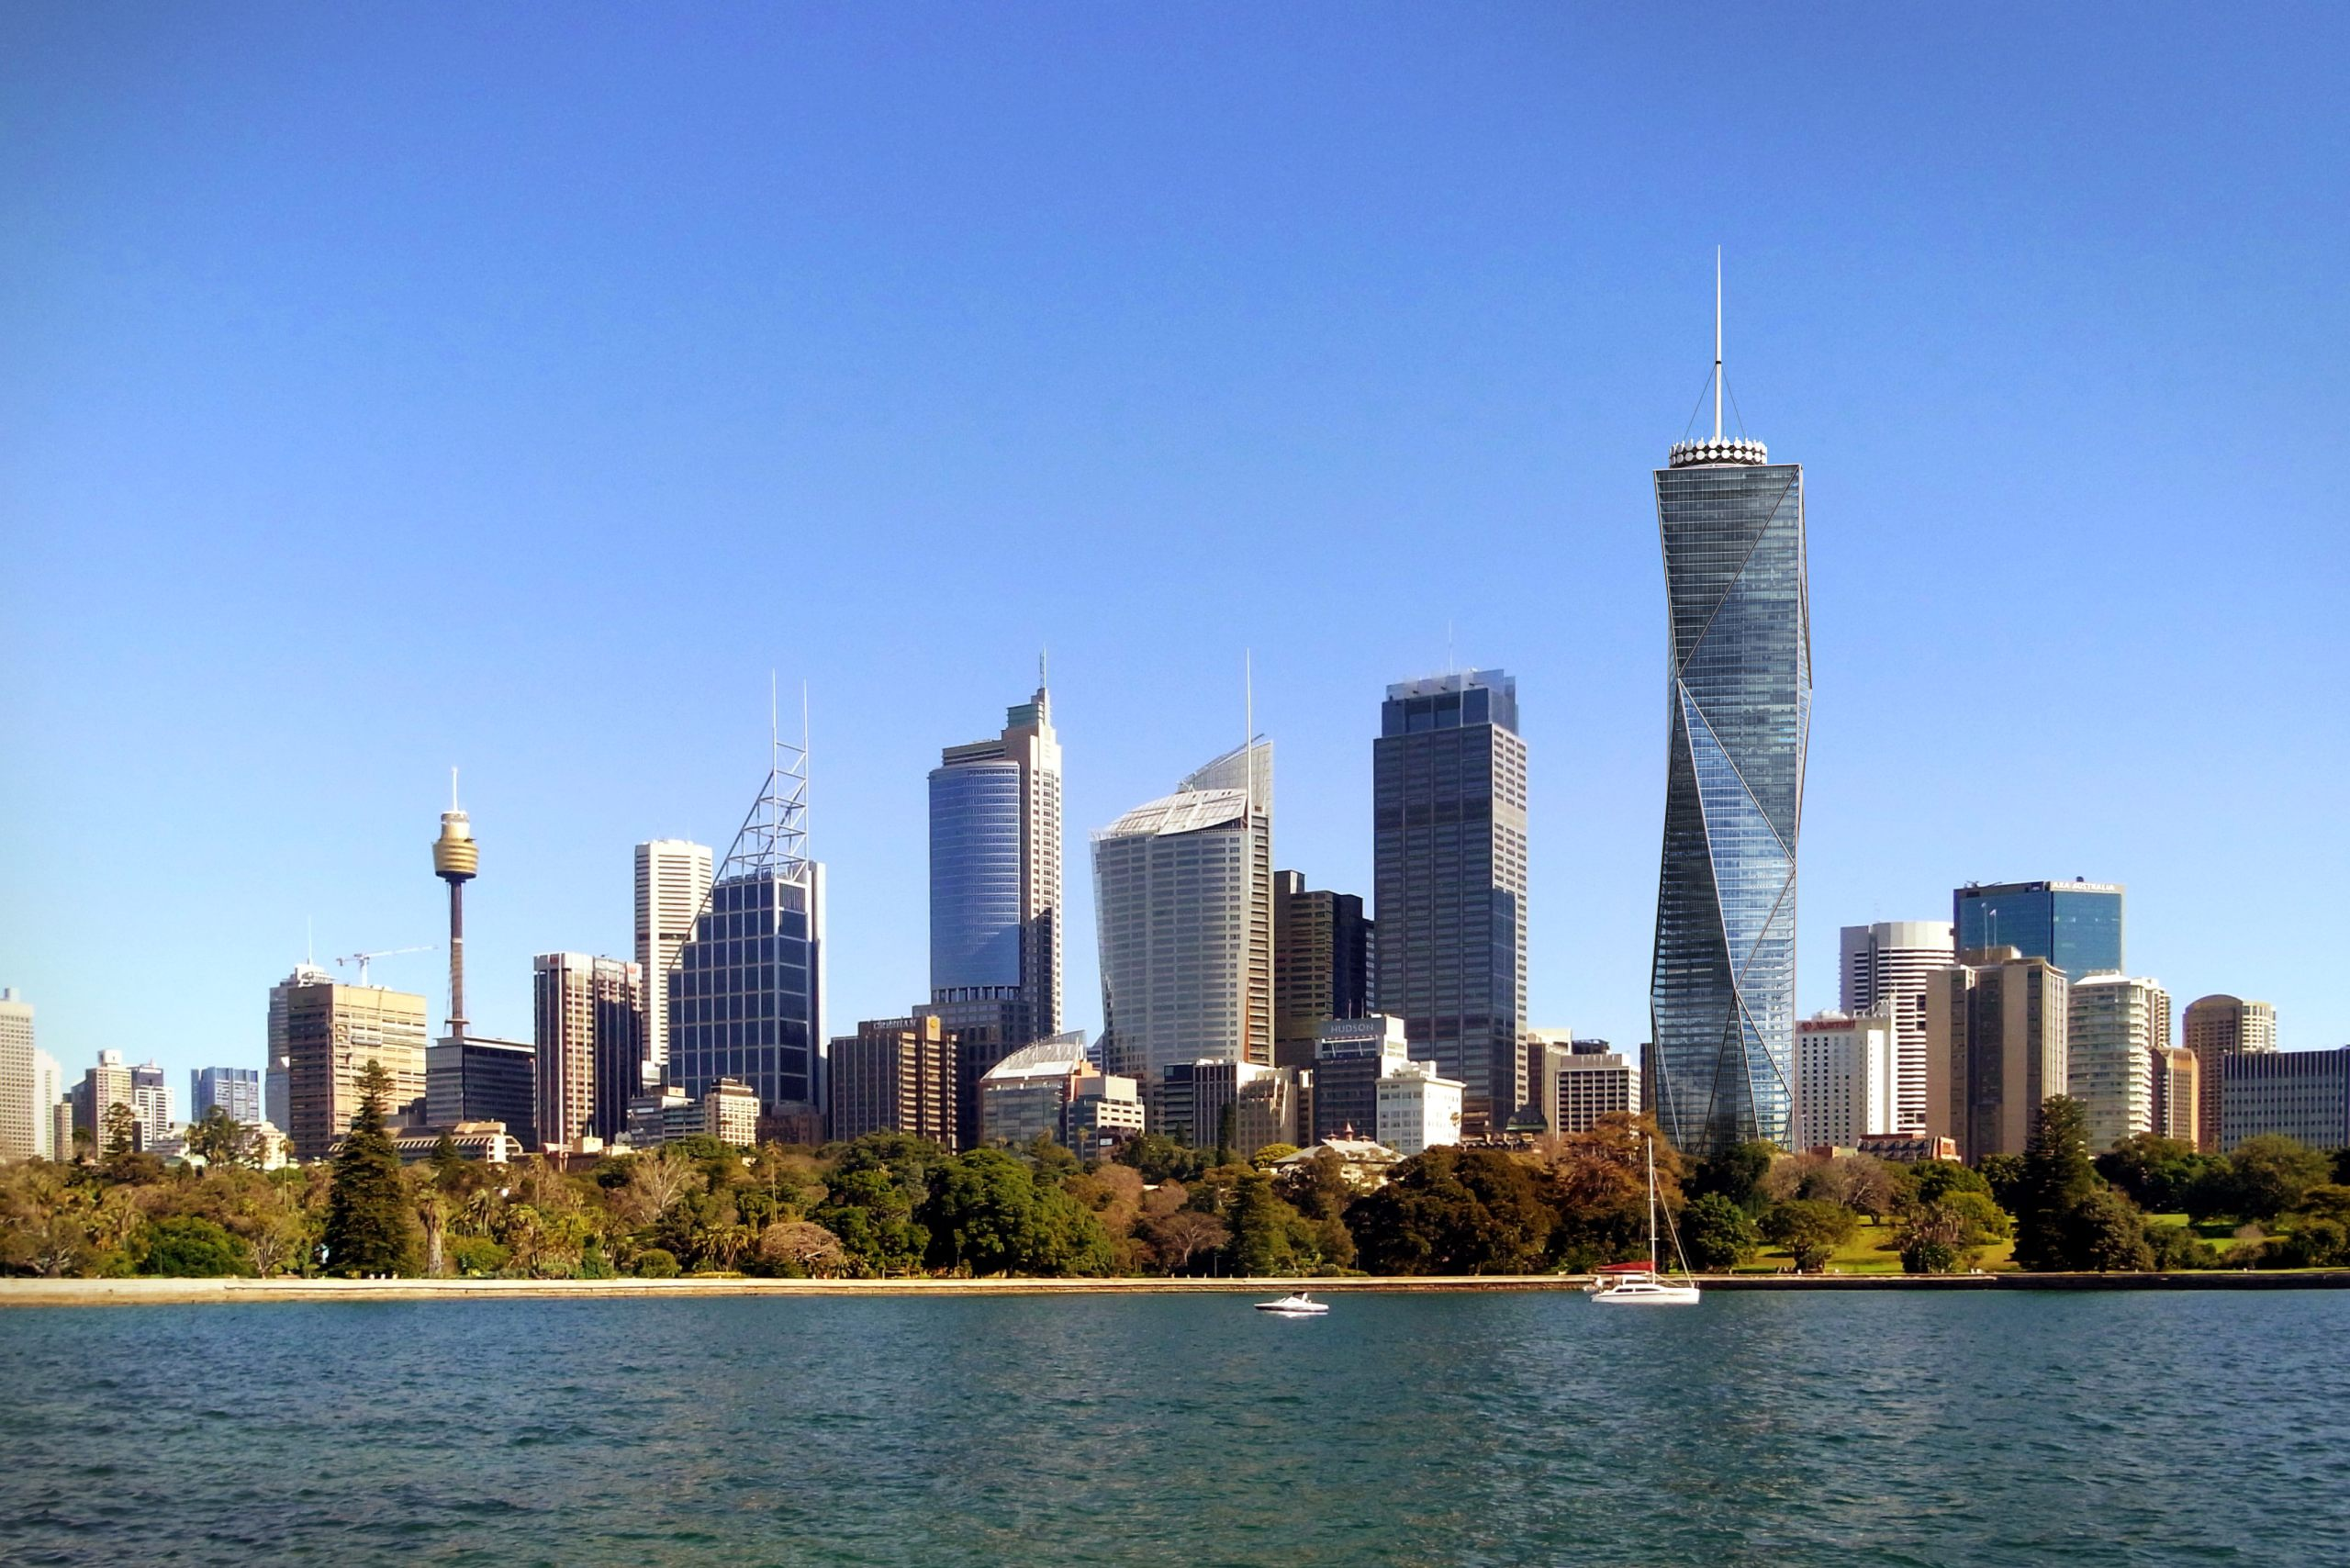 Tallest Sydney skyscraper